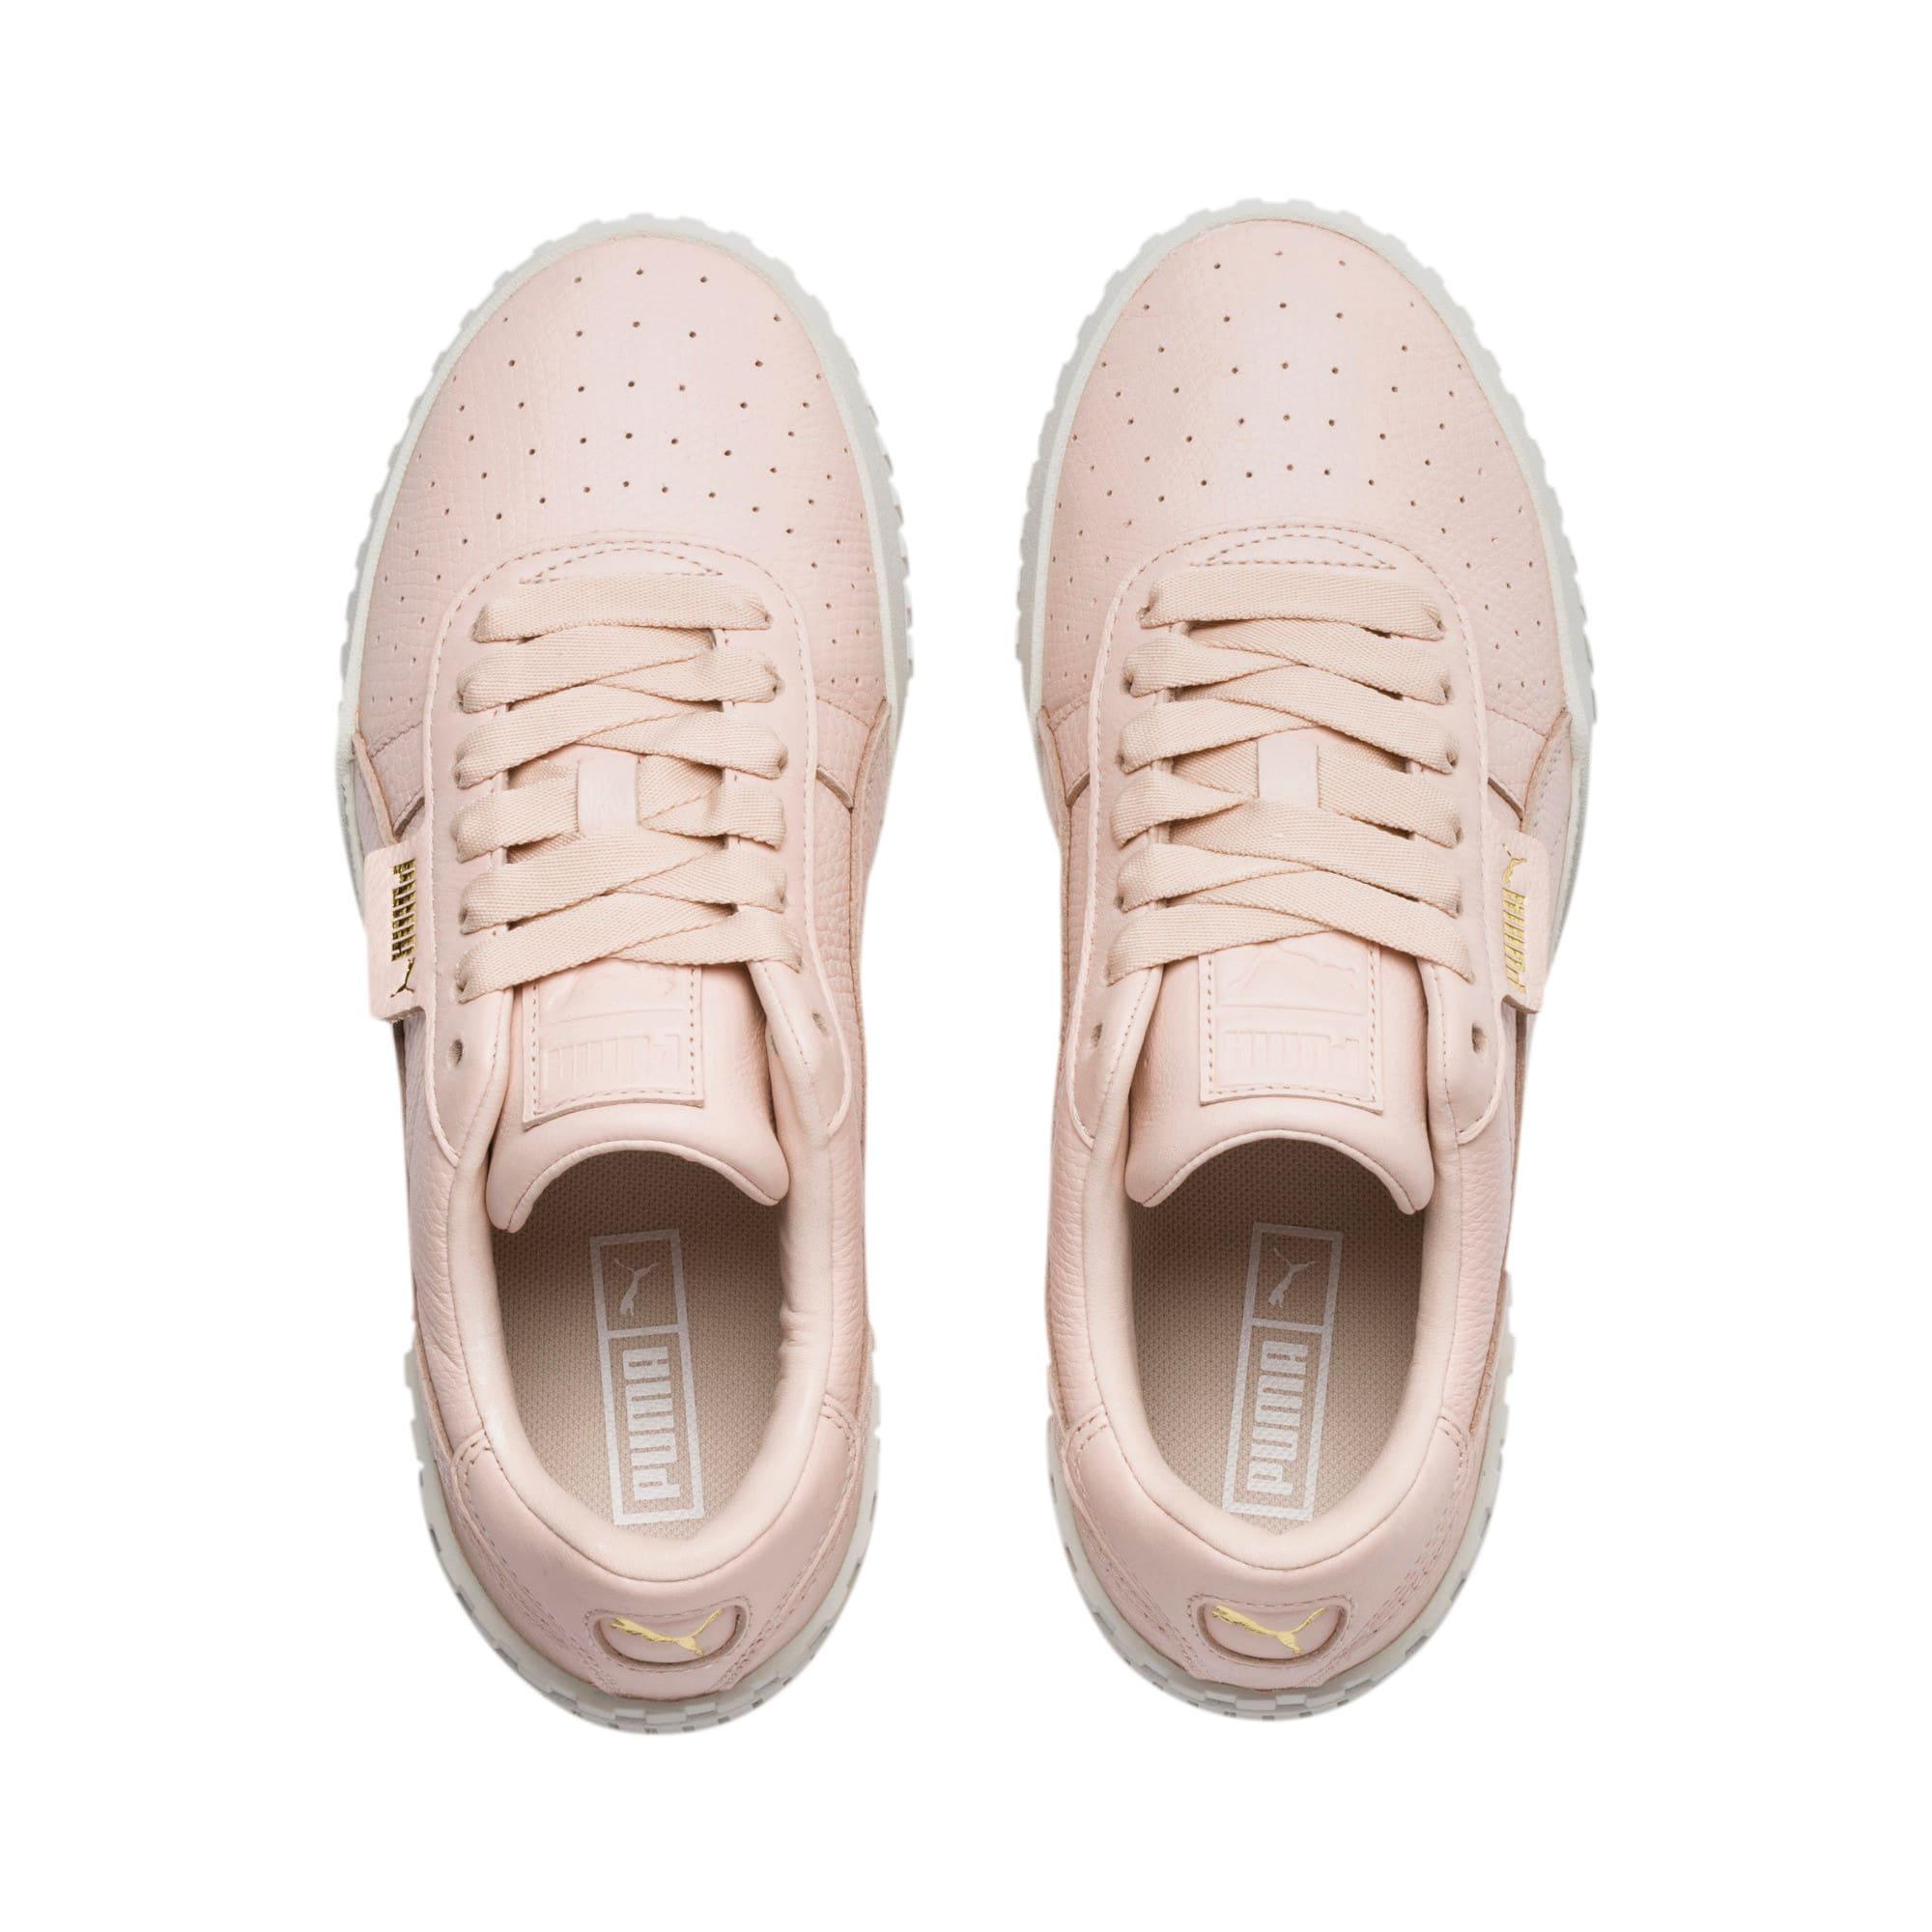 Thumbnail 7 of Cali Emboss Women's Sneakers, Cream Tan-Cream Tan, medium